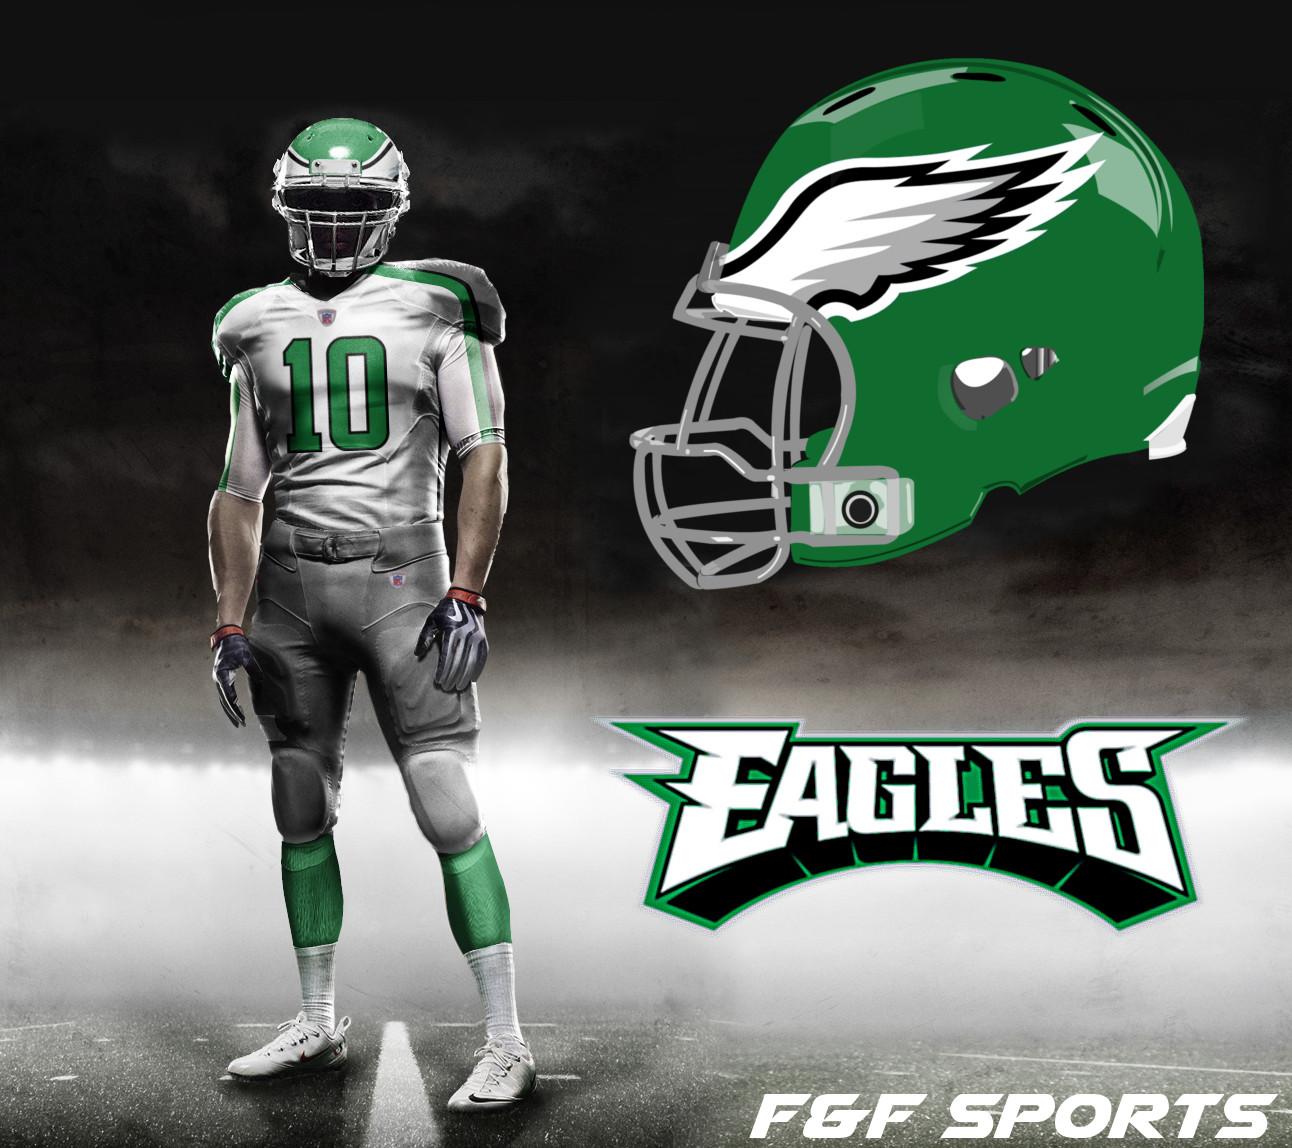 799c2313228 NFL Uniform Concept – F&F Sports